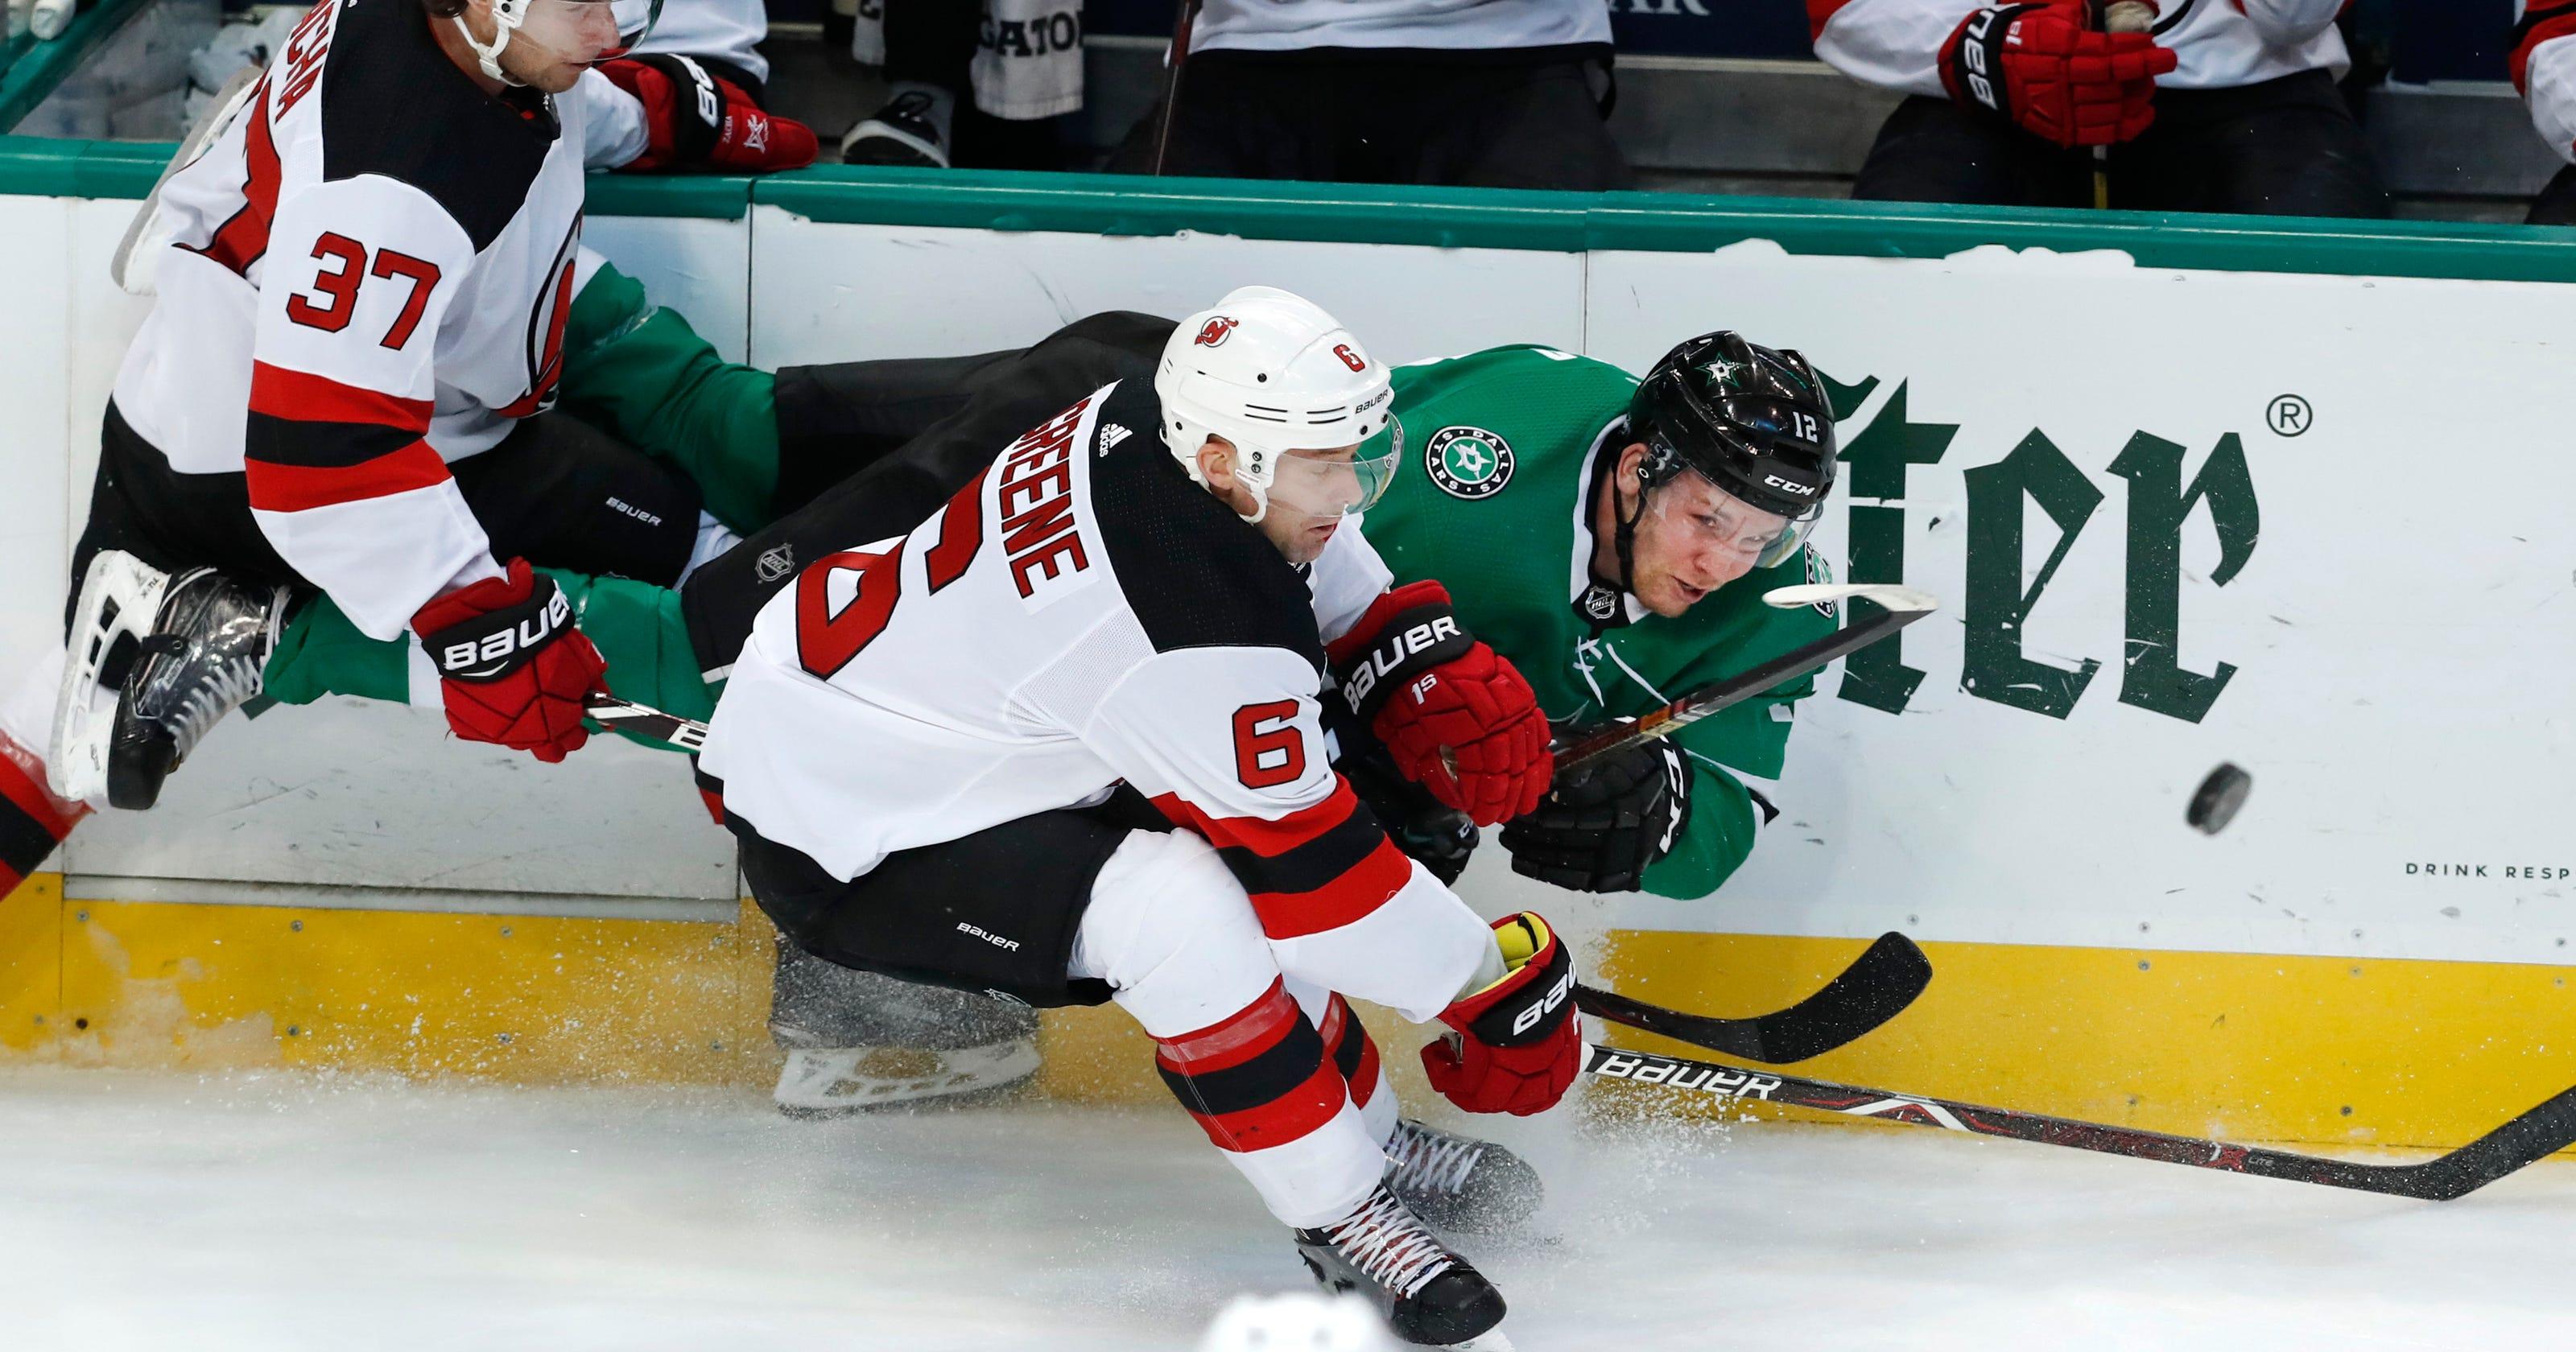 f12d5c425a5 Heiskanen's third-period goal lifts Stars over Devils 5-4